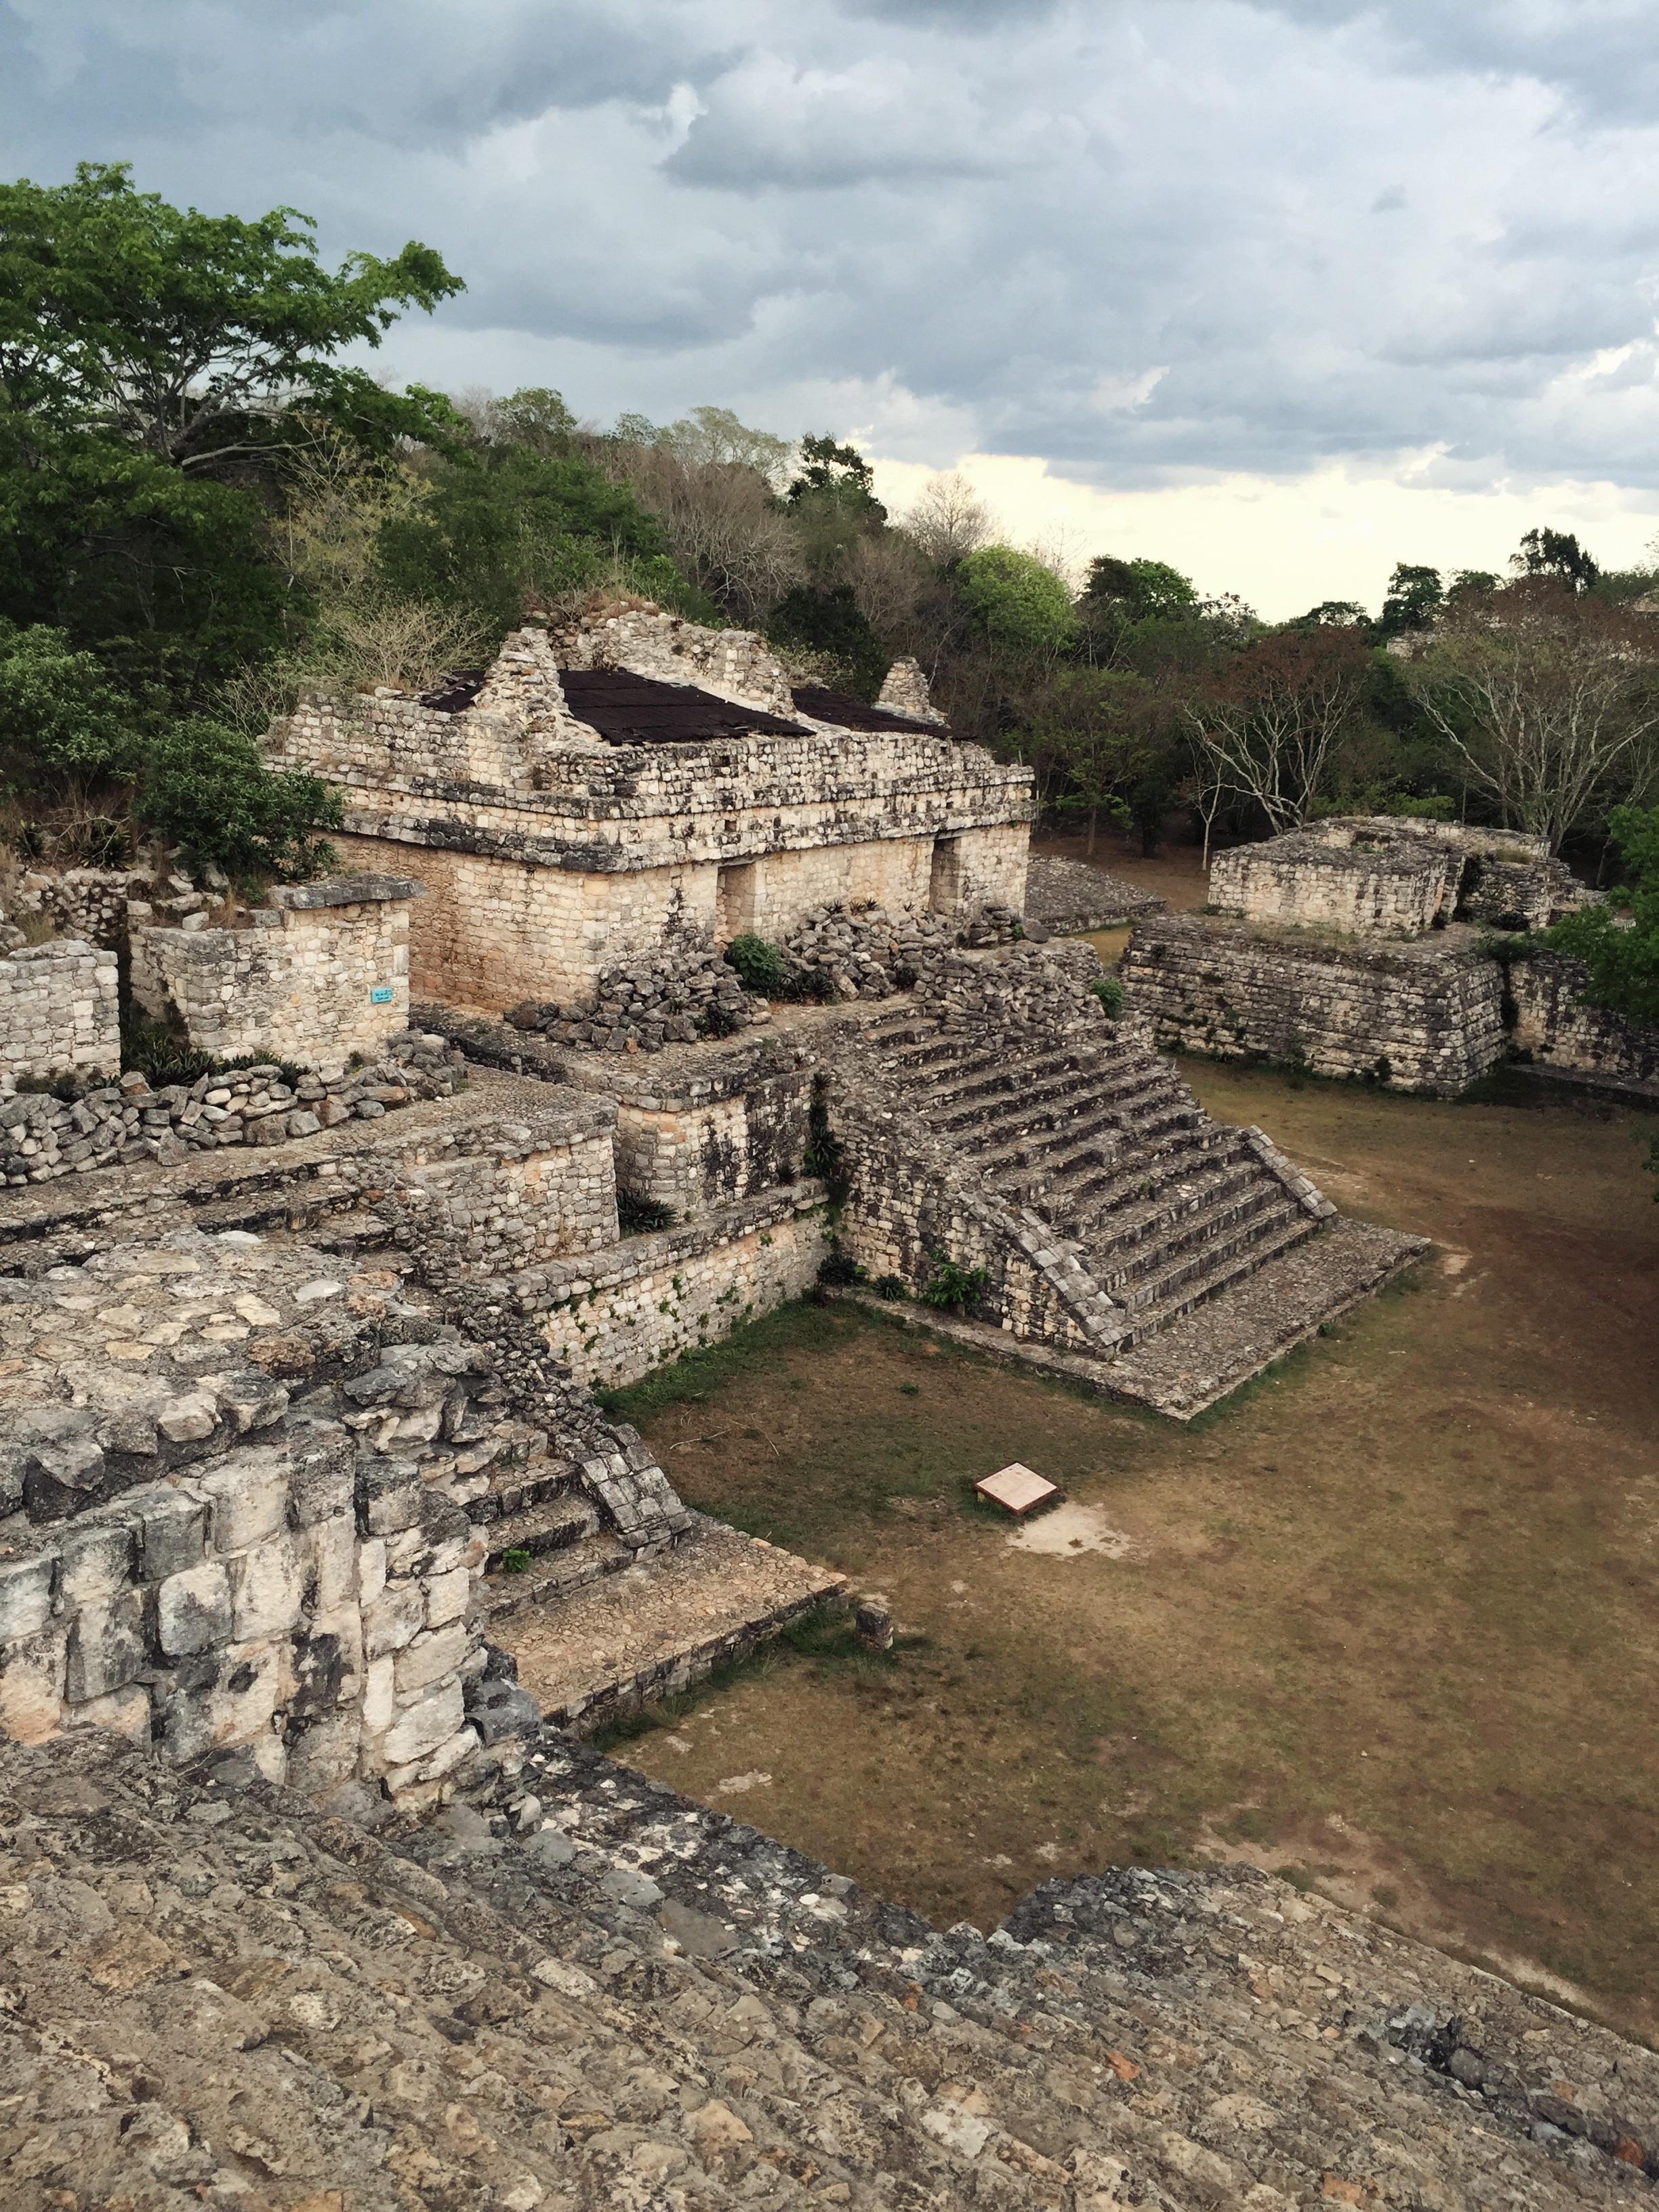 Ek-Balam, Yucatán, Mexico